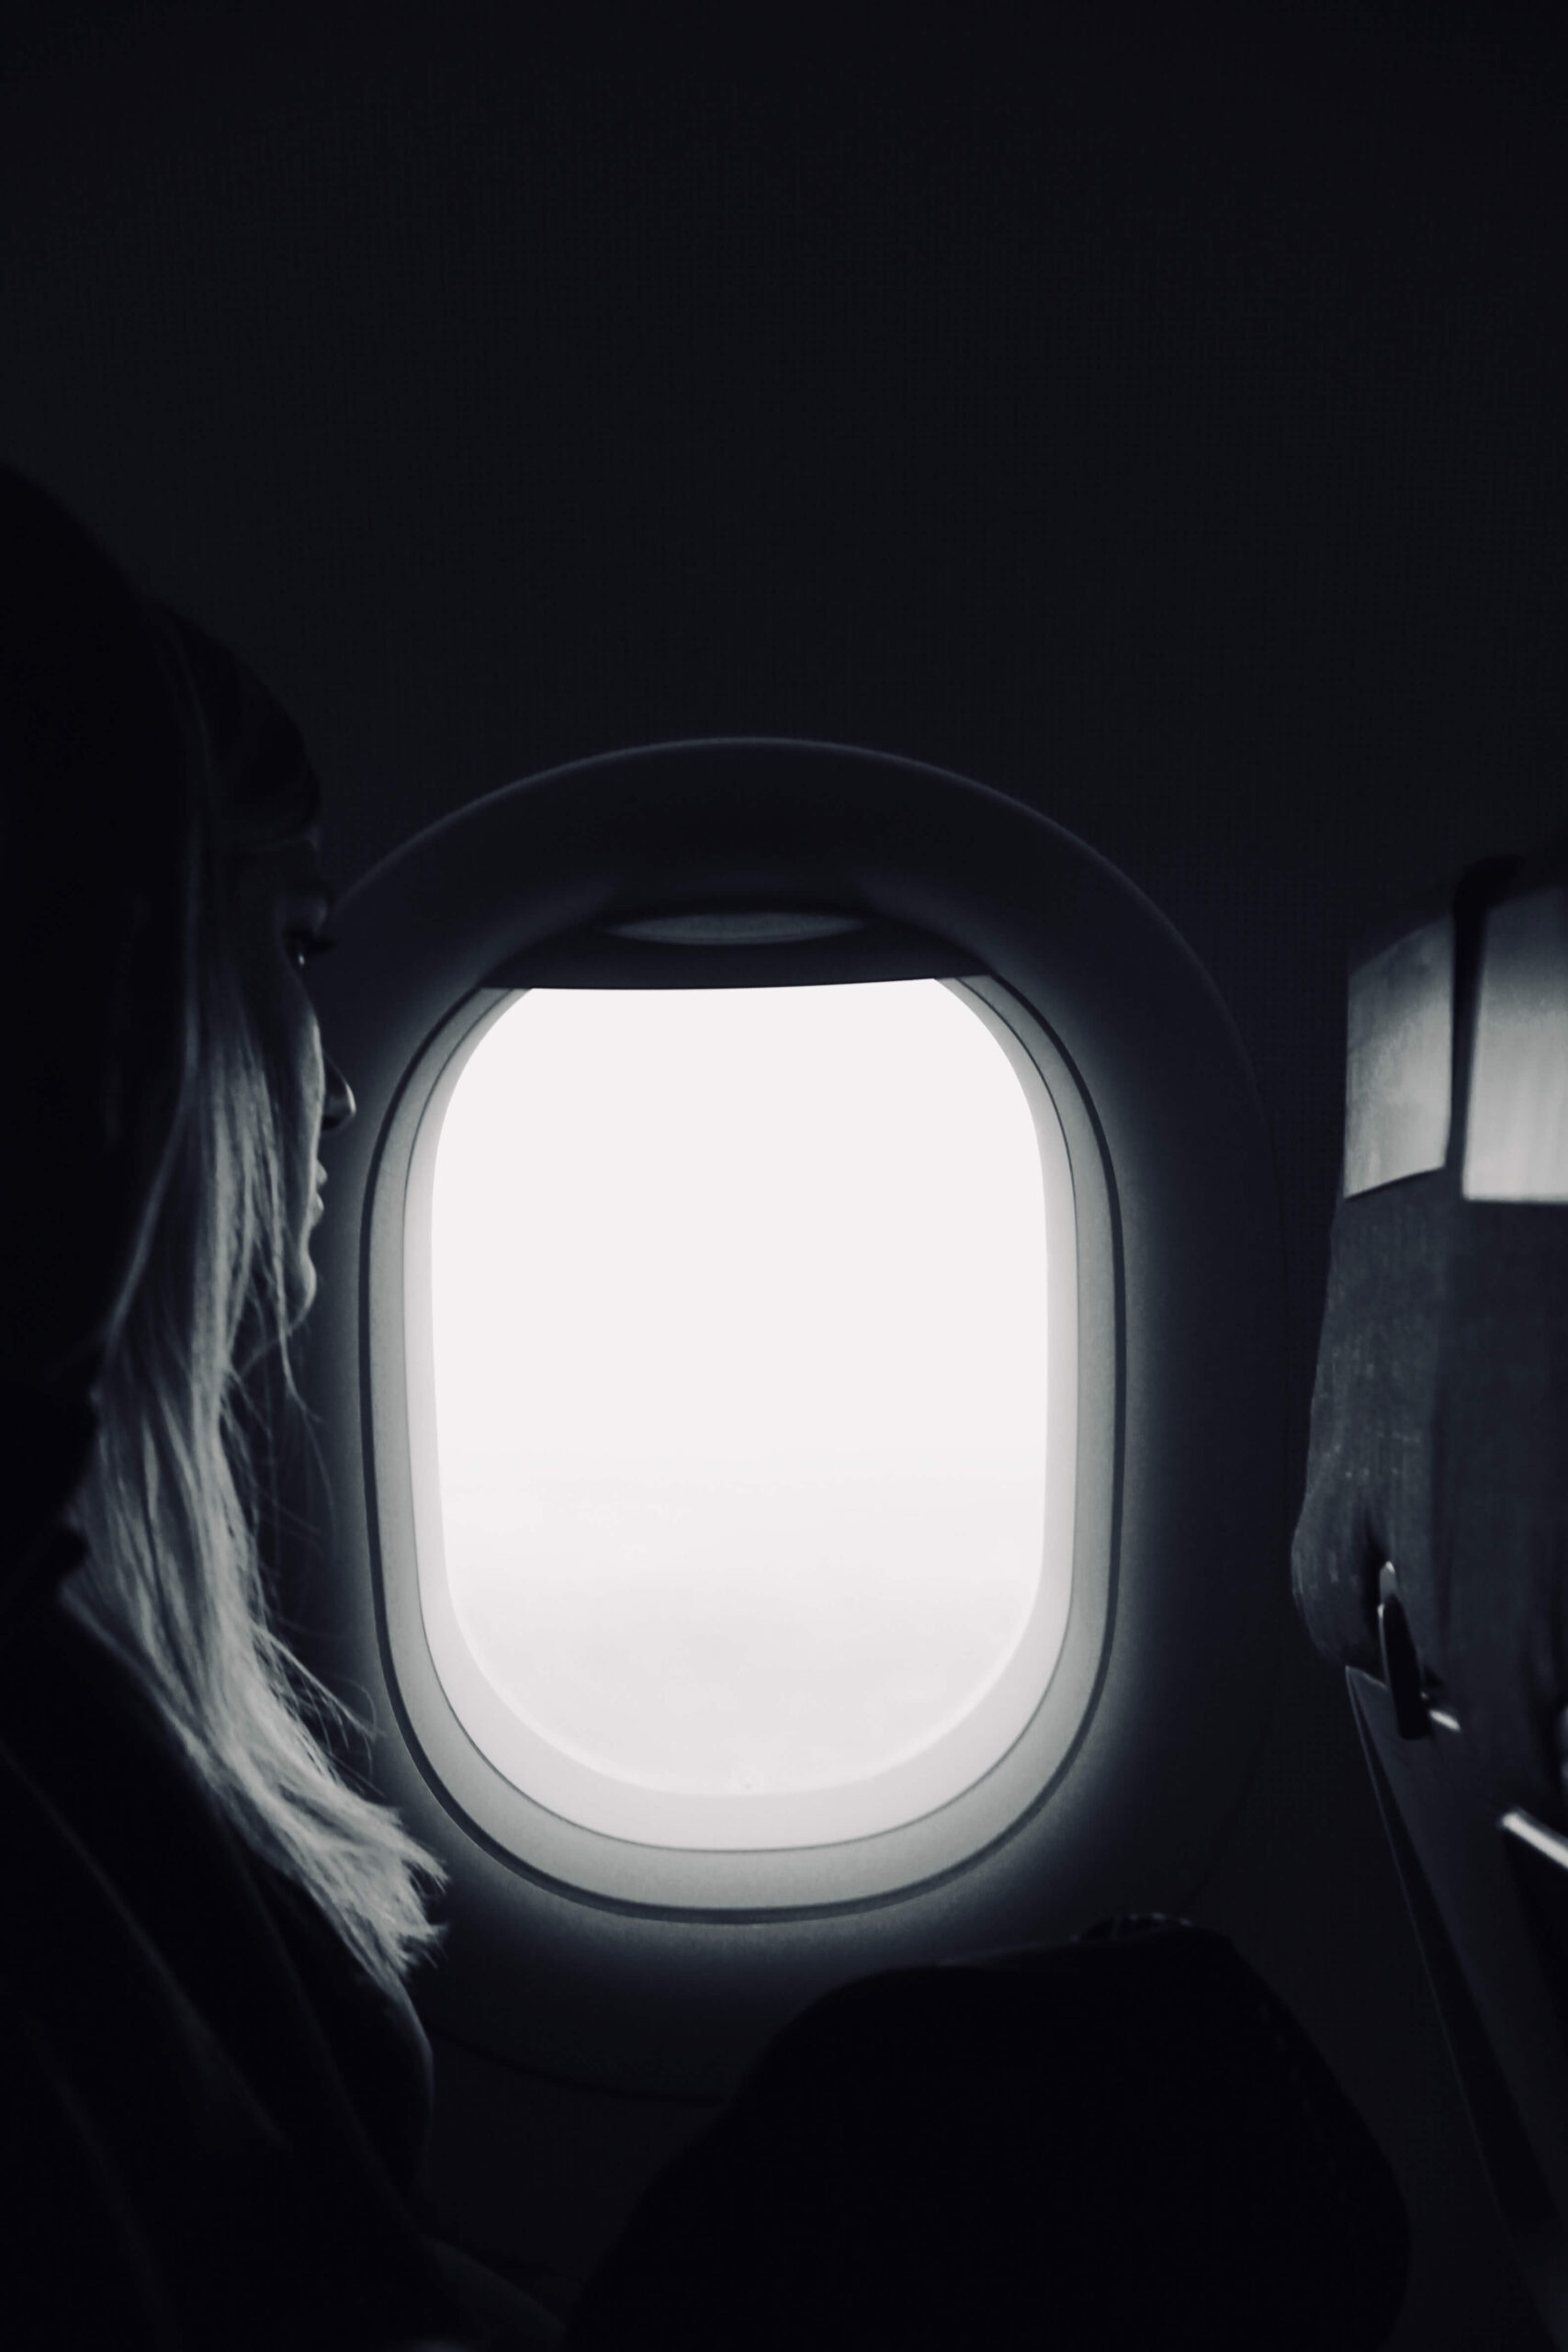 Flysæde